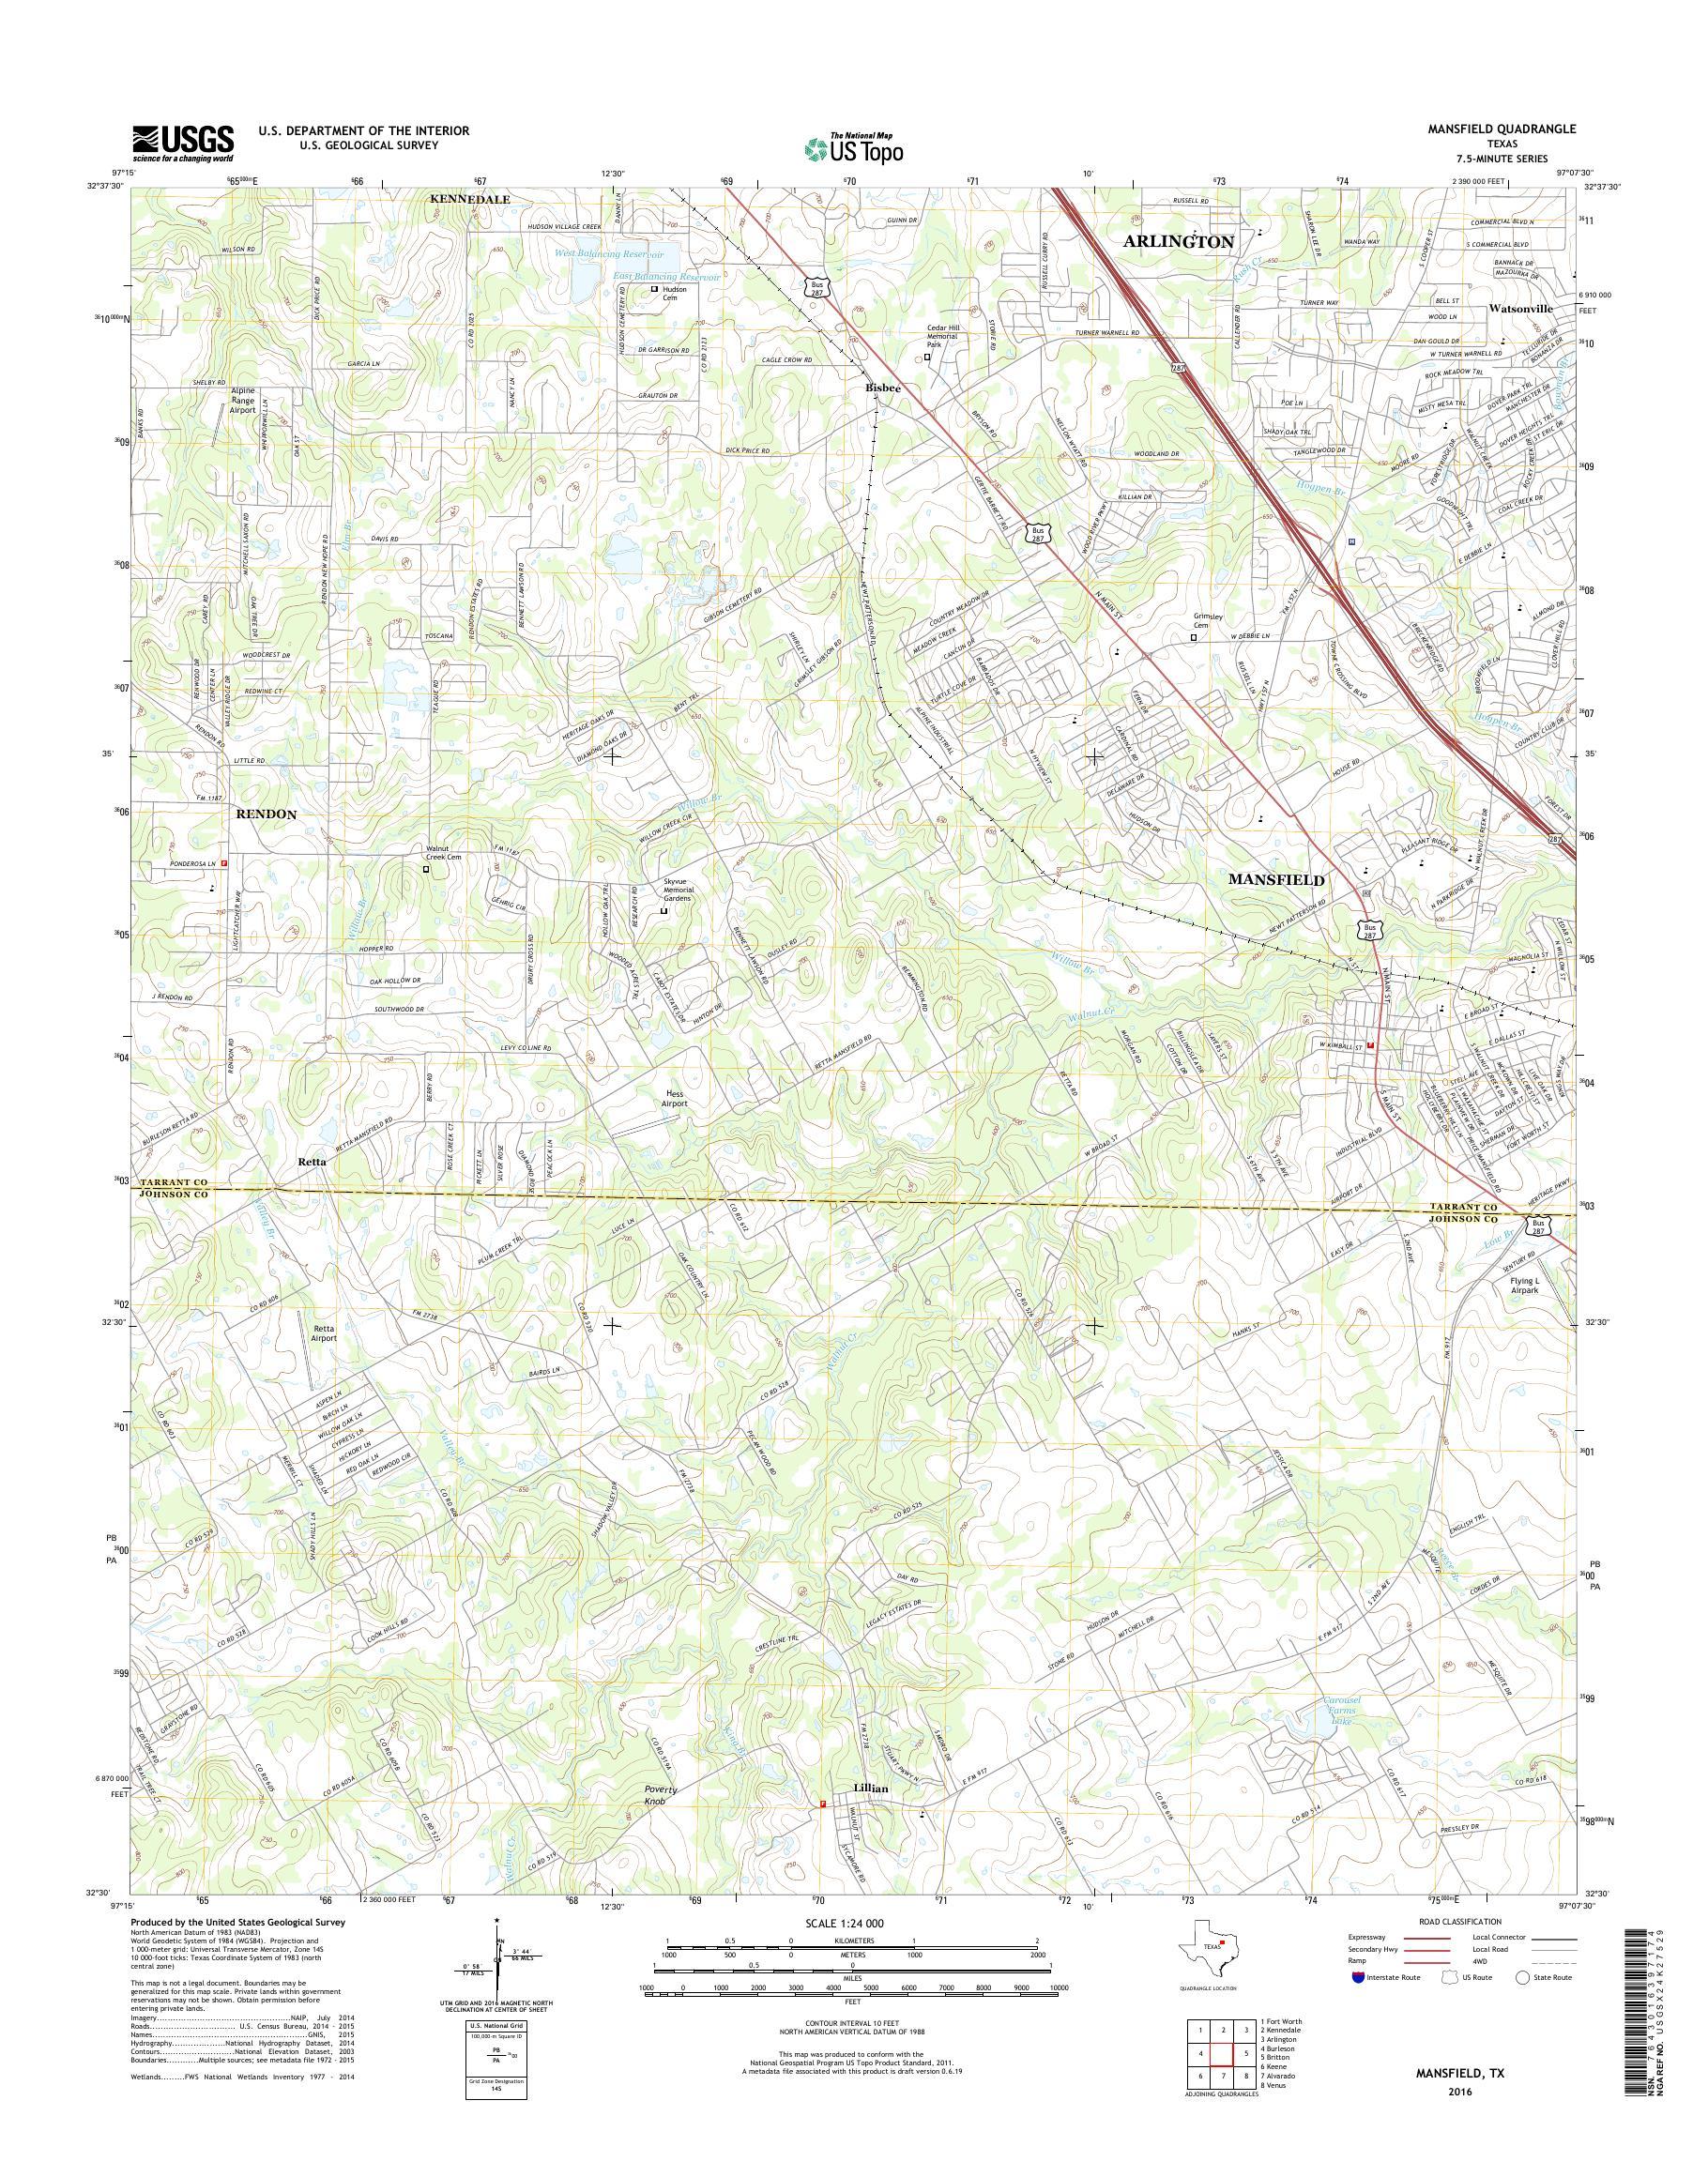 MyTopo Mansfield, Texas USGS Quad Topo Map on